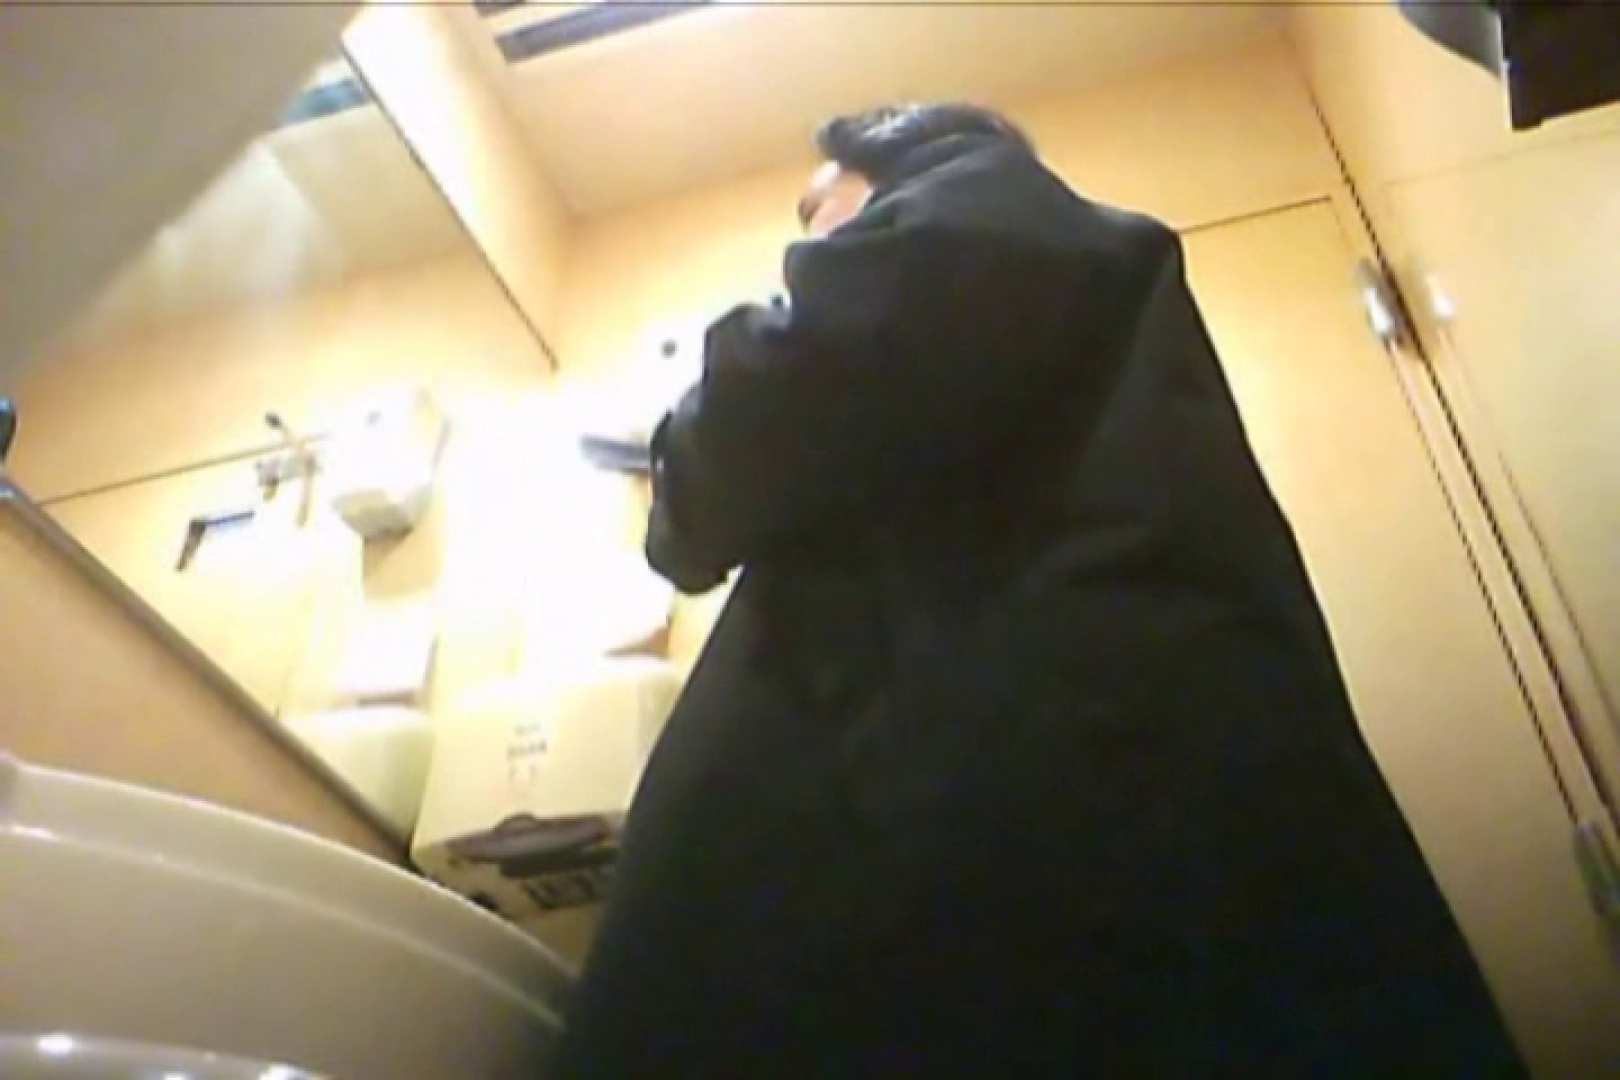 SEASON 2ND!掴み取りさんの洗面所覗き!in新幹線!VOL.12 念願の完全無修正 ゲイエロビデオ画像 19連発 16